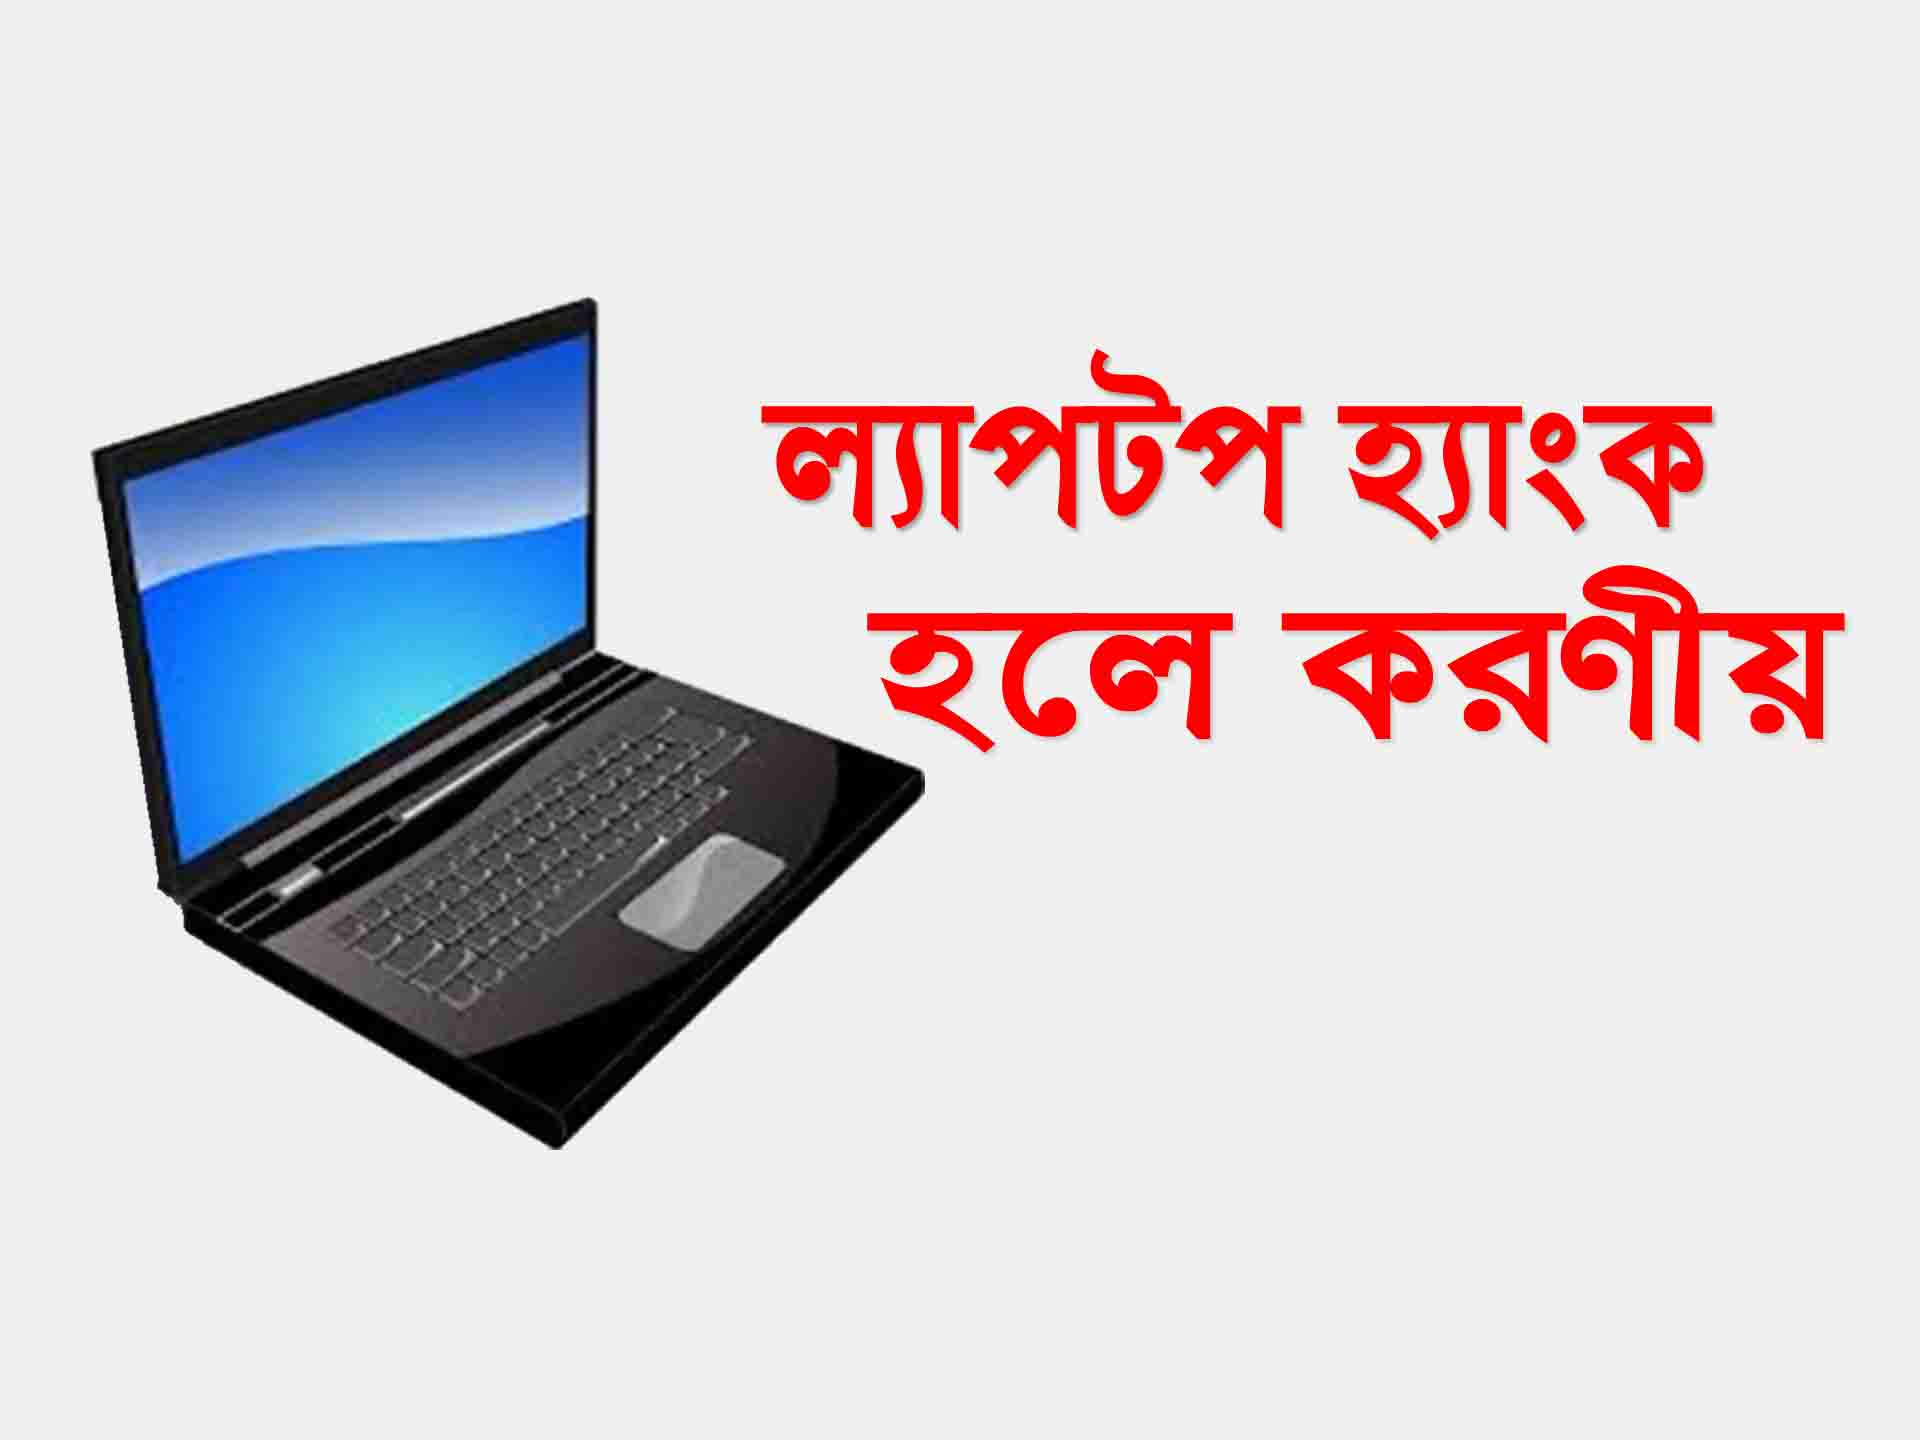 Laptops hang problems solution-ল্যাপটপ হ্যাংক হলে